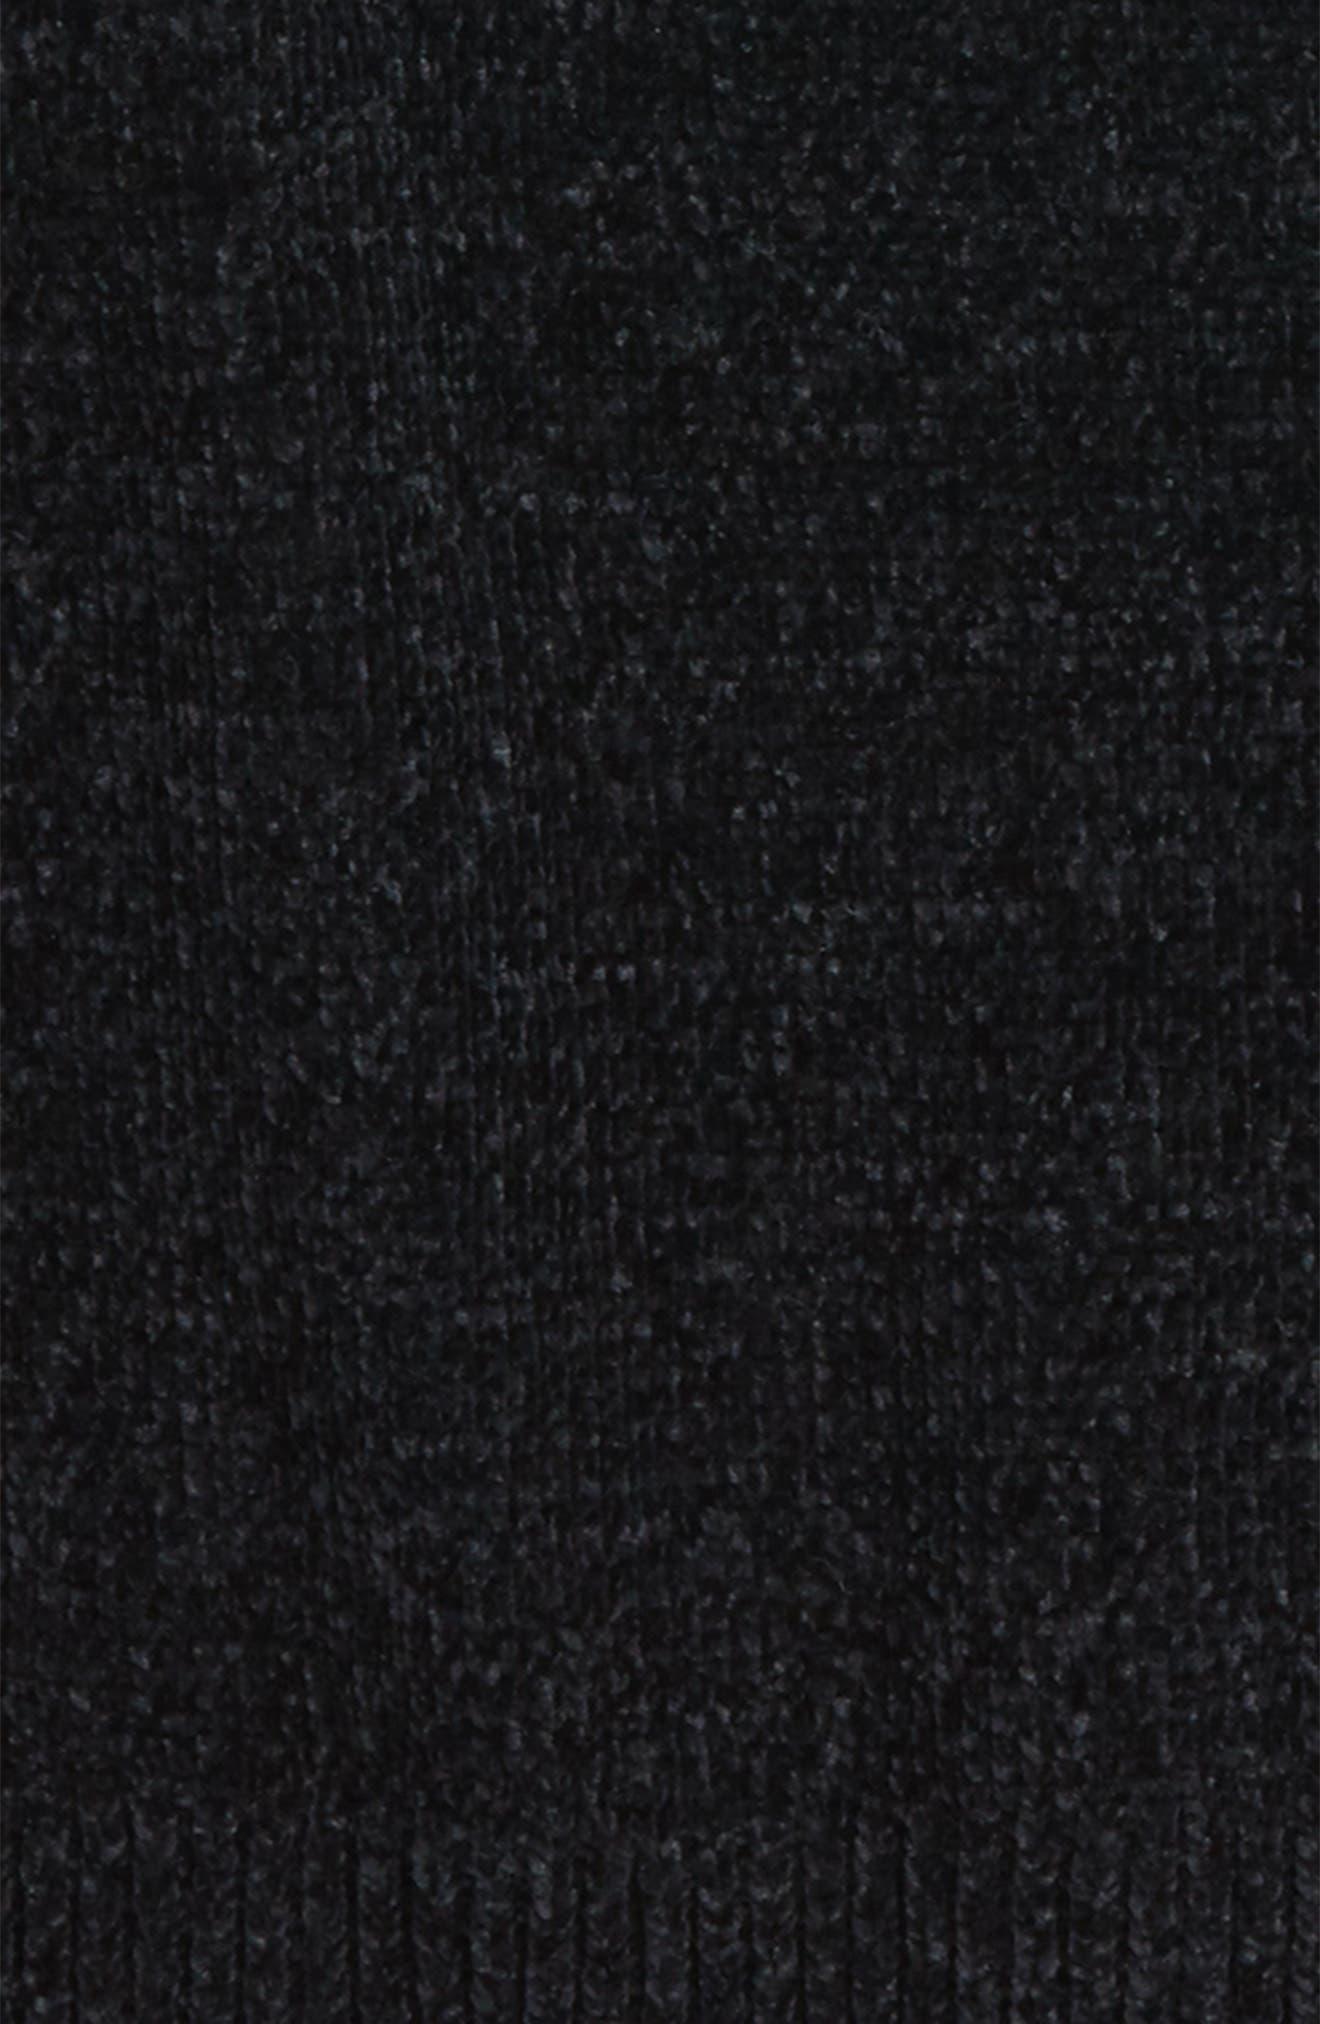 Chenille Mock Neck Sweater,                             Alternate thumbnail 2, color,                             001